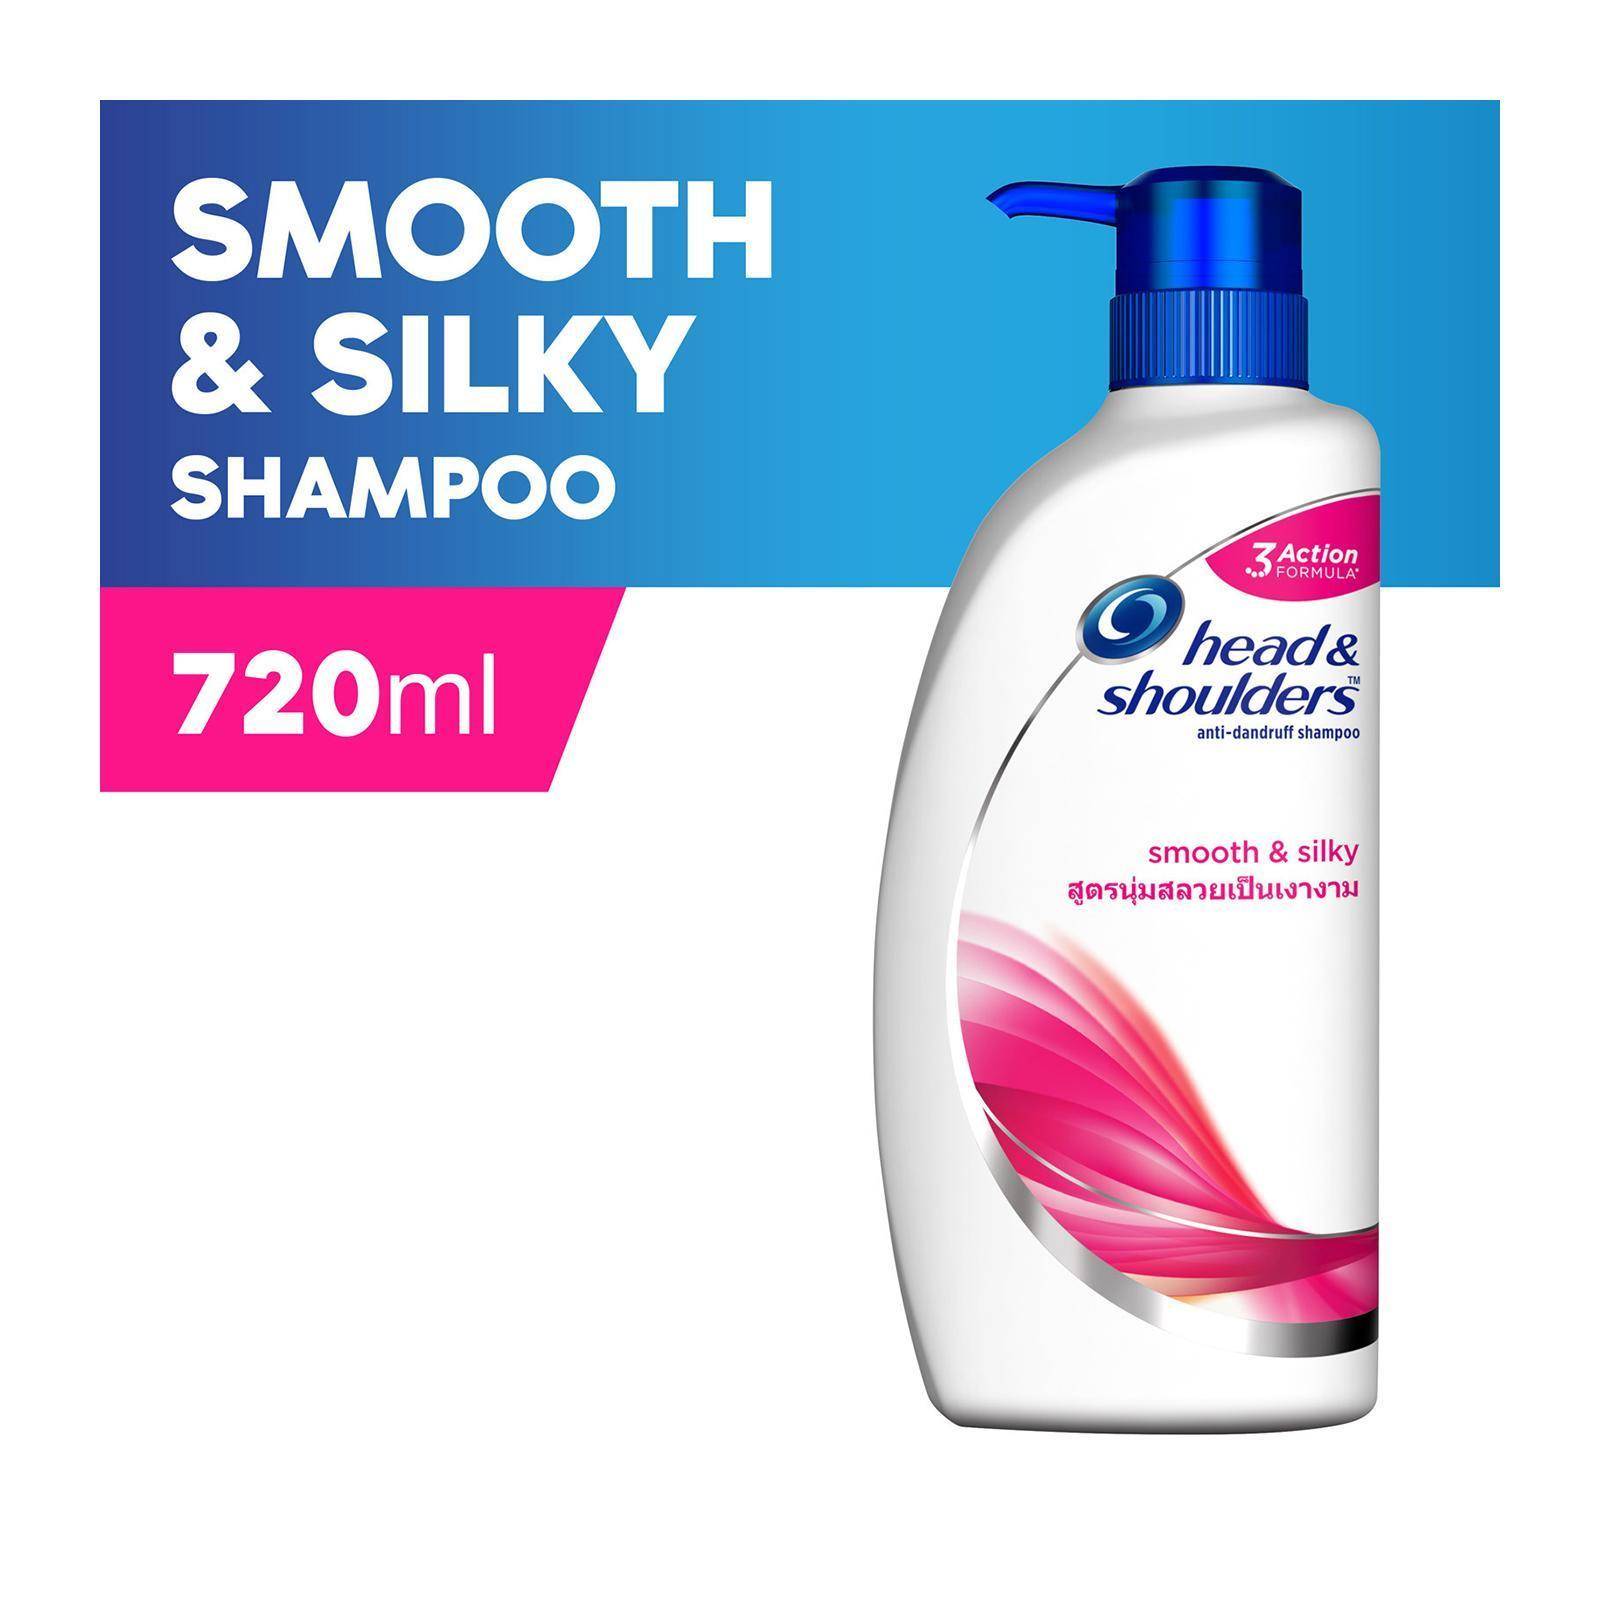 Head & Shoulders Smooth And Silky Anti-Dandruff Shampoo 720ml